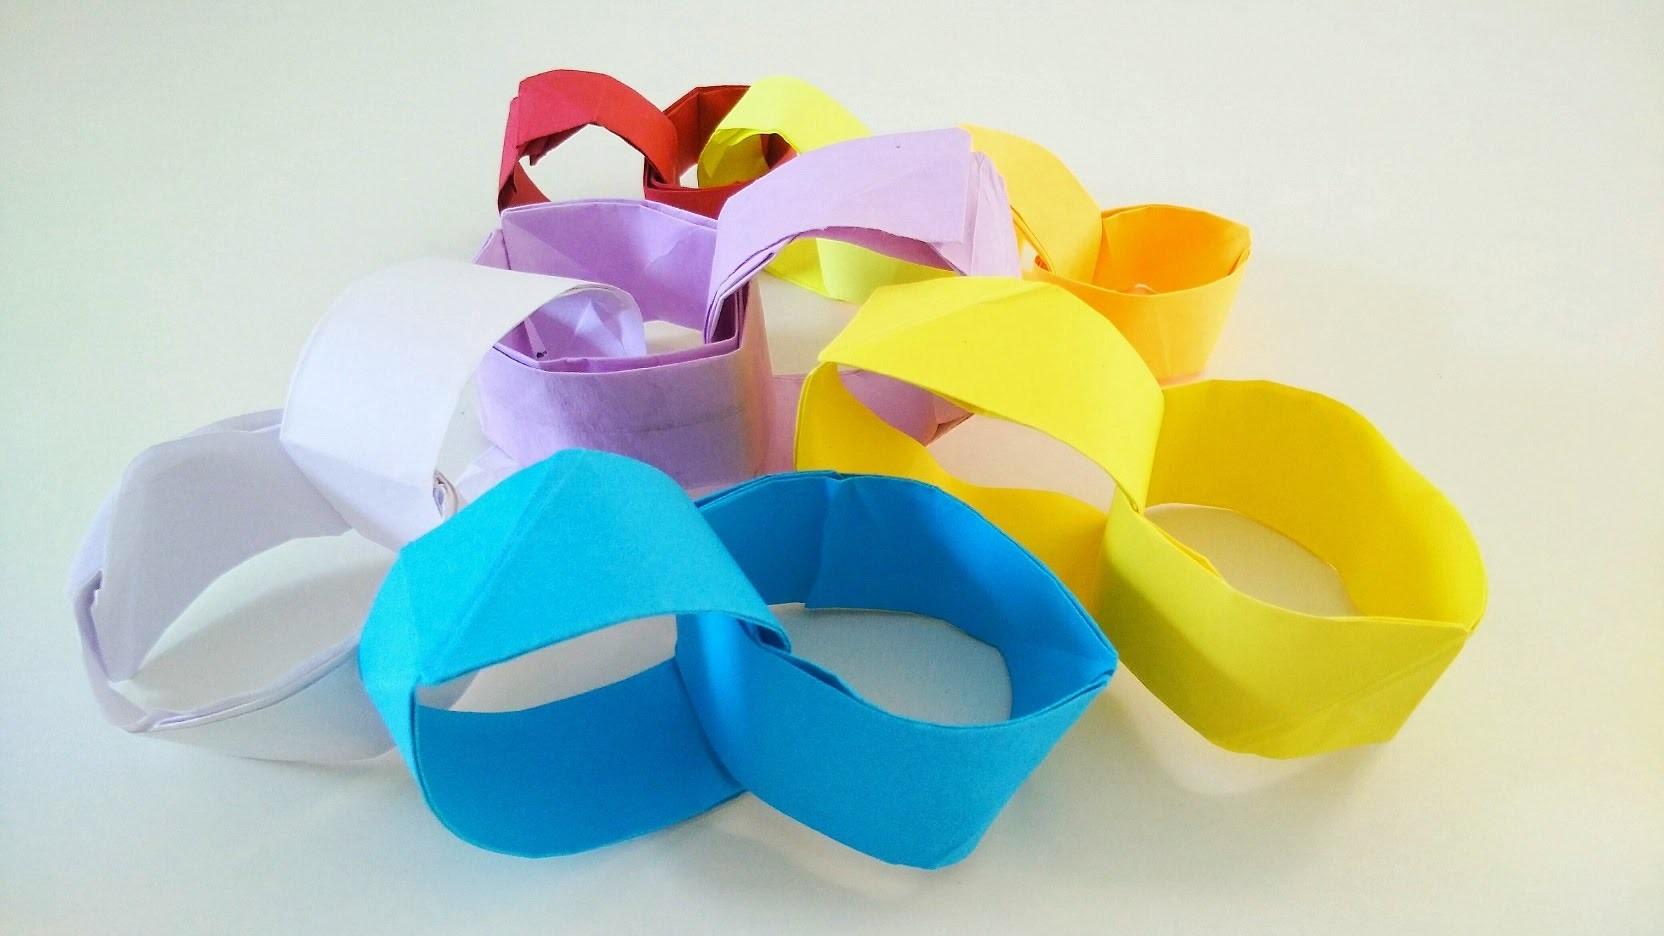 Origami Paper - Interlocking Rings (Single Square Sheet)